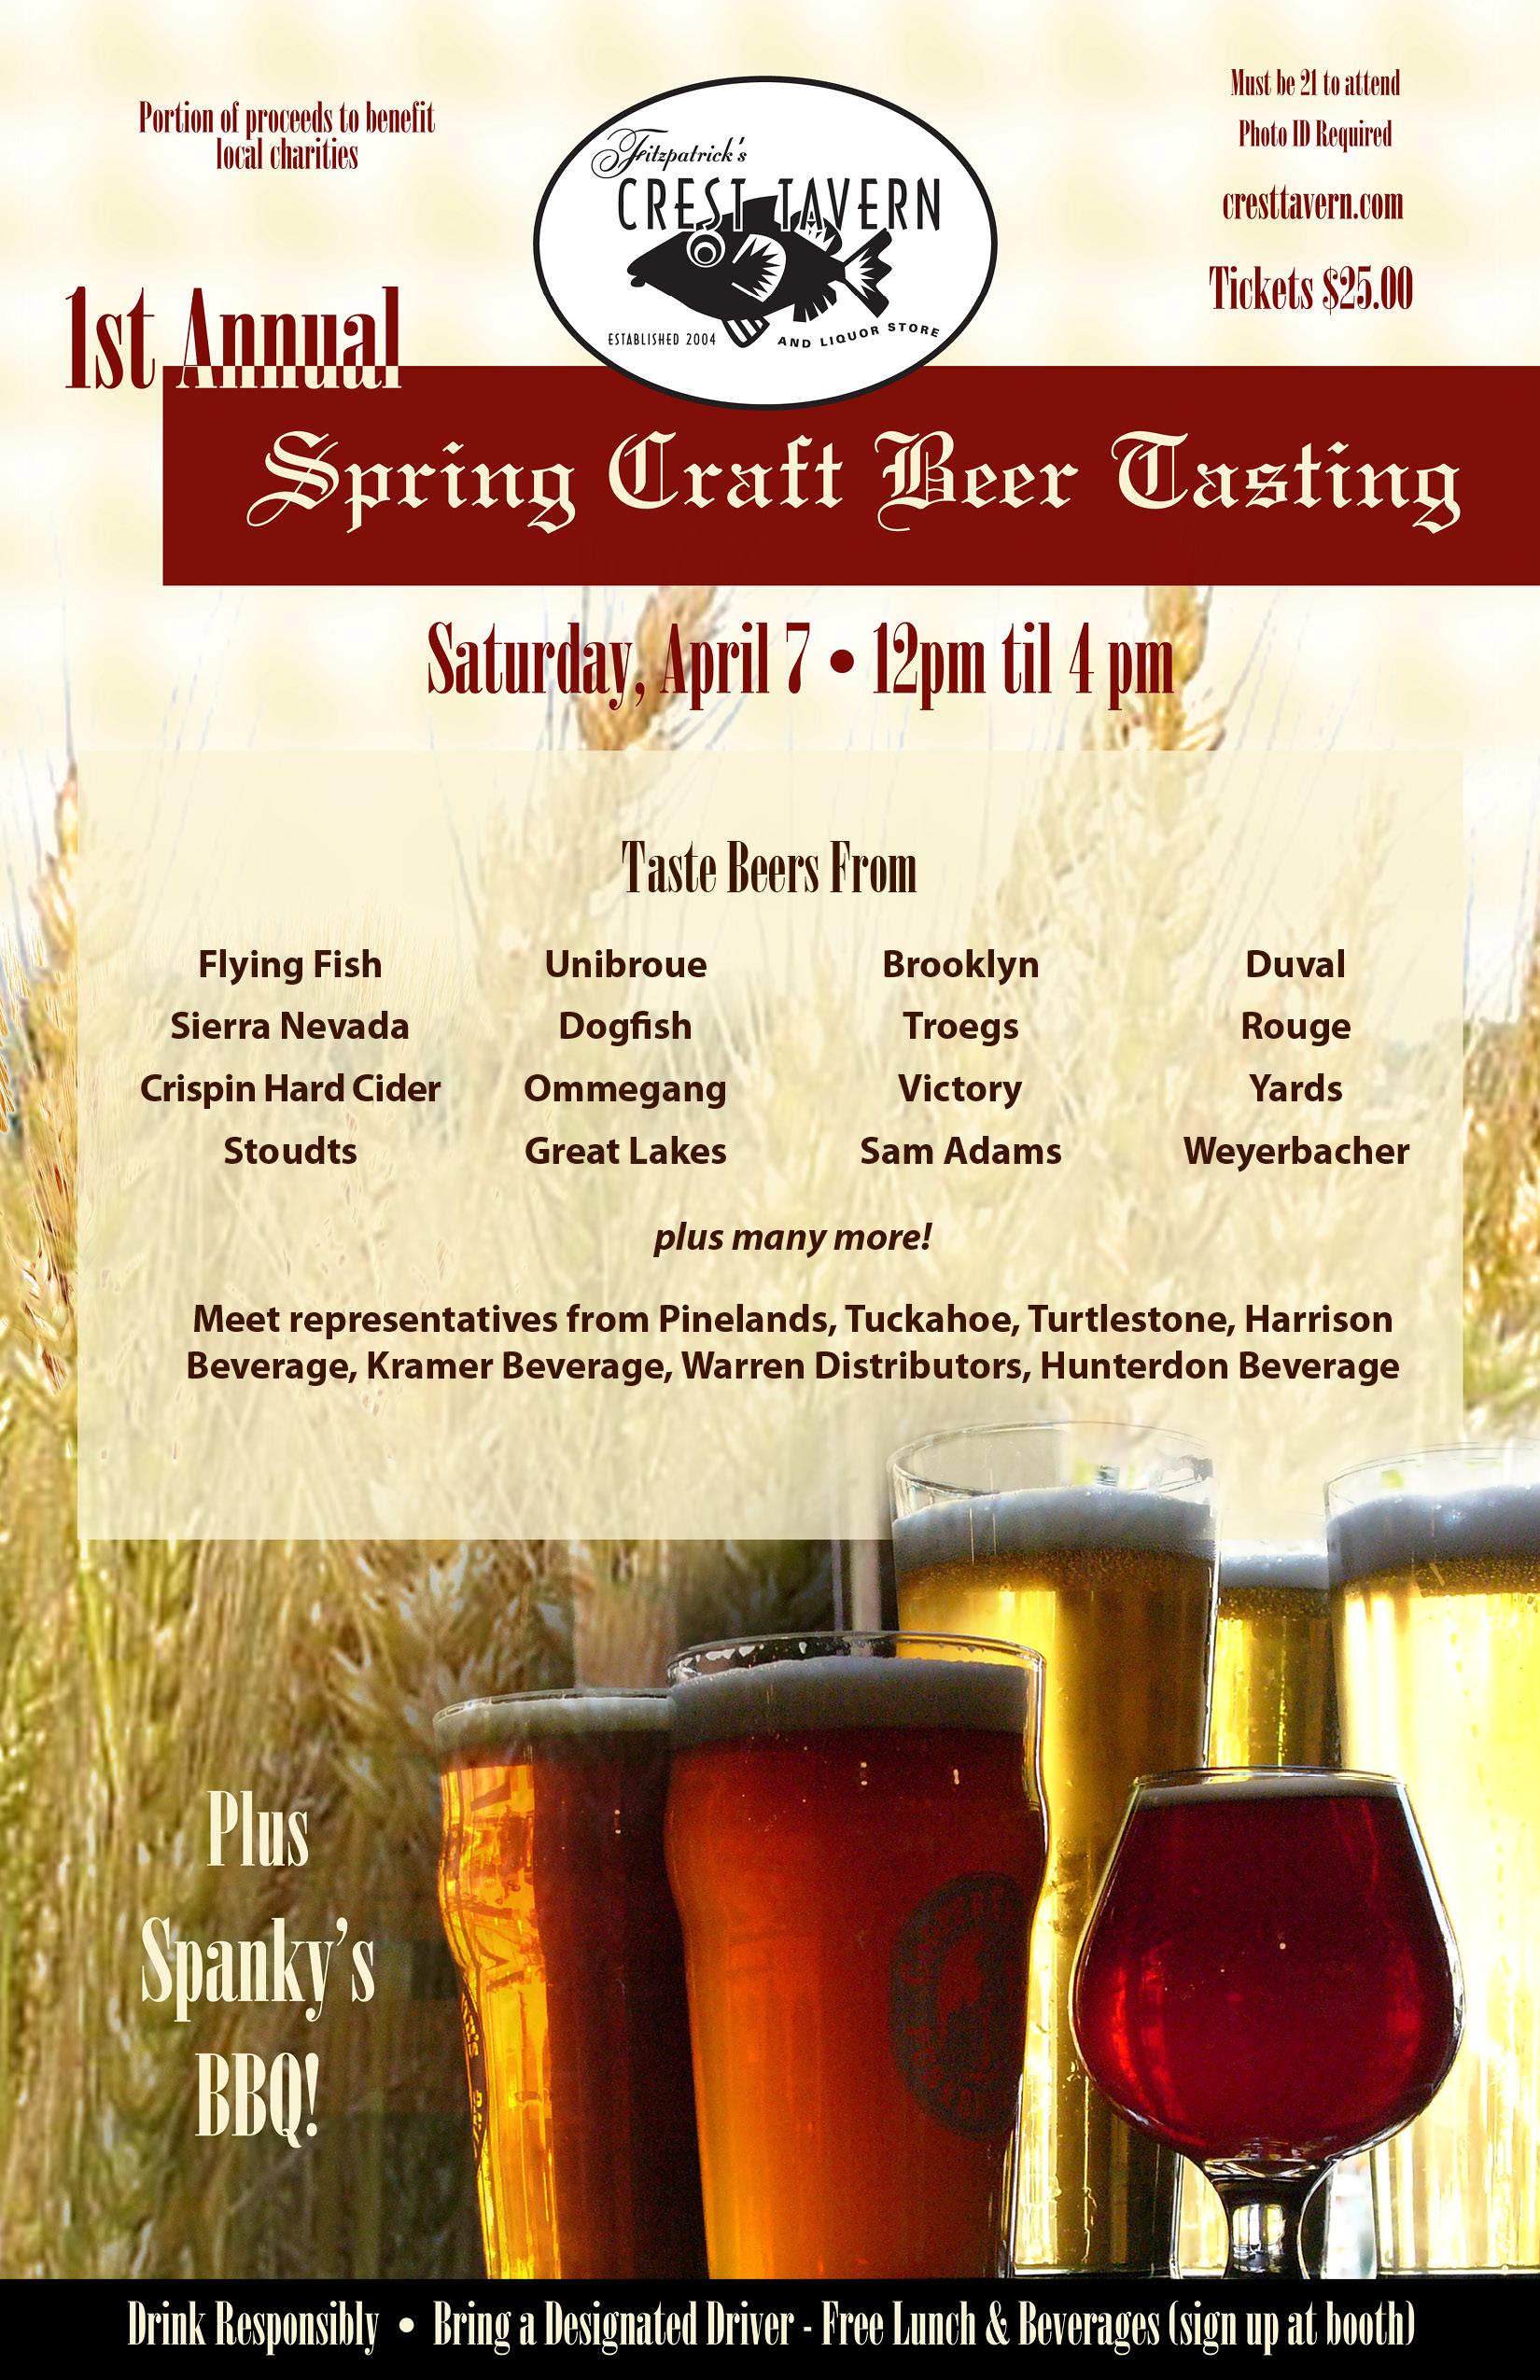 1st Annual Spring Craft Beer Tasting